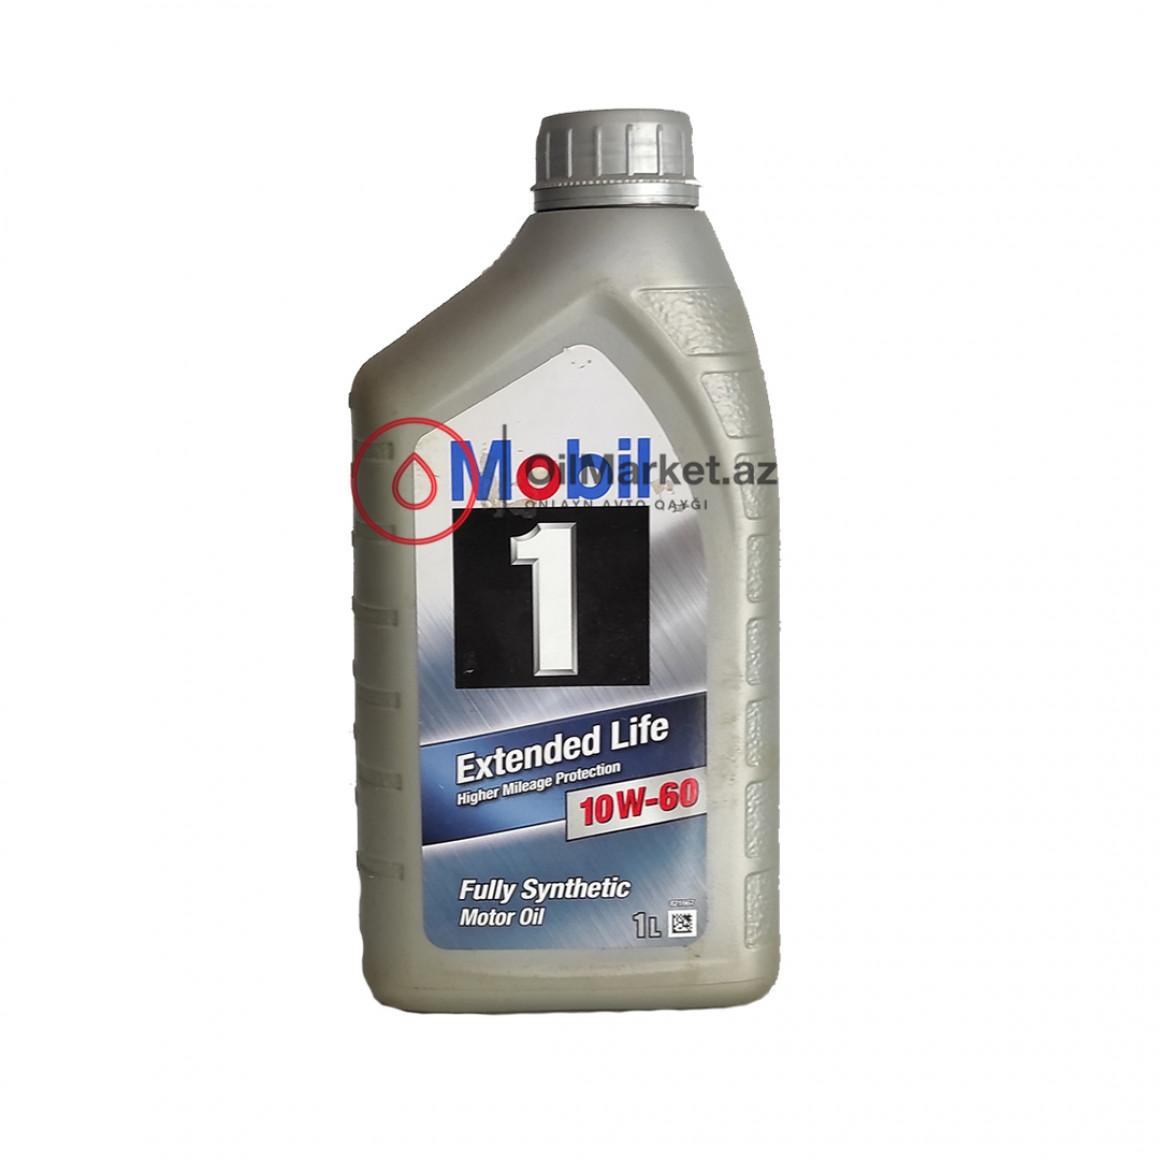 Mobil 1 Extended Life 10w-60 - 1 Lt